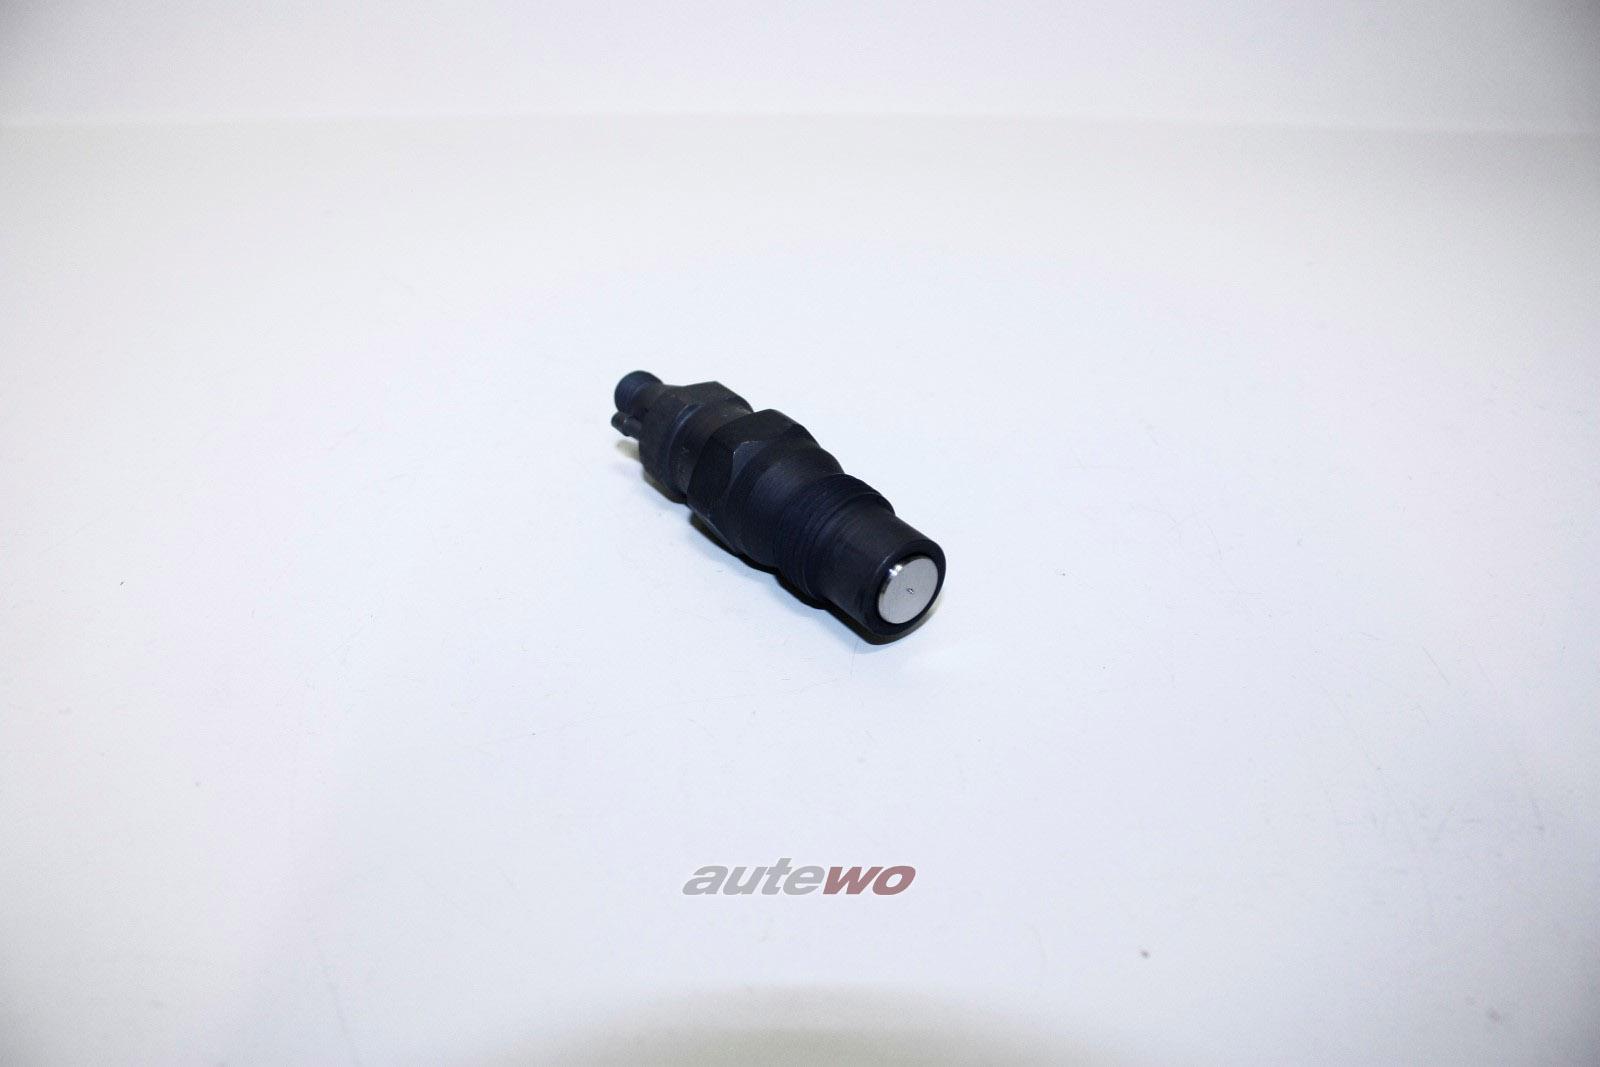 068130201NX 068130201N Bosch KCA 30 S 44 Audi/VW 80 Typ 89 1.6l Einspritzdüse